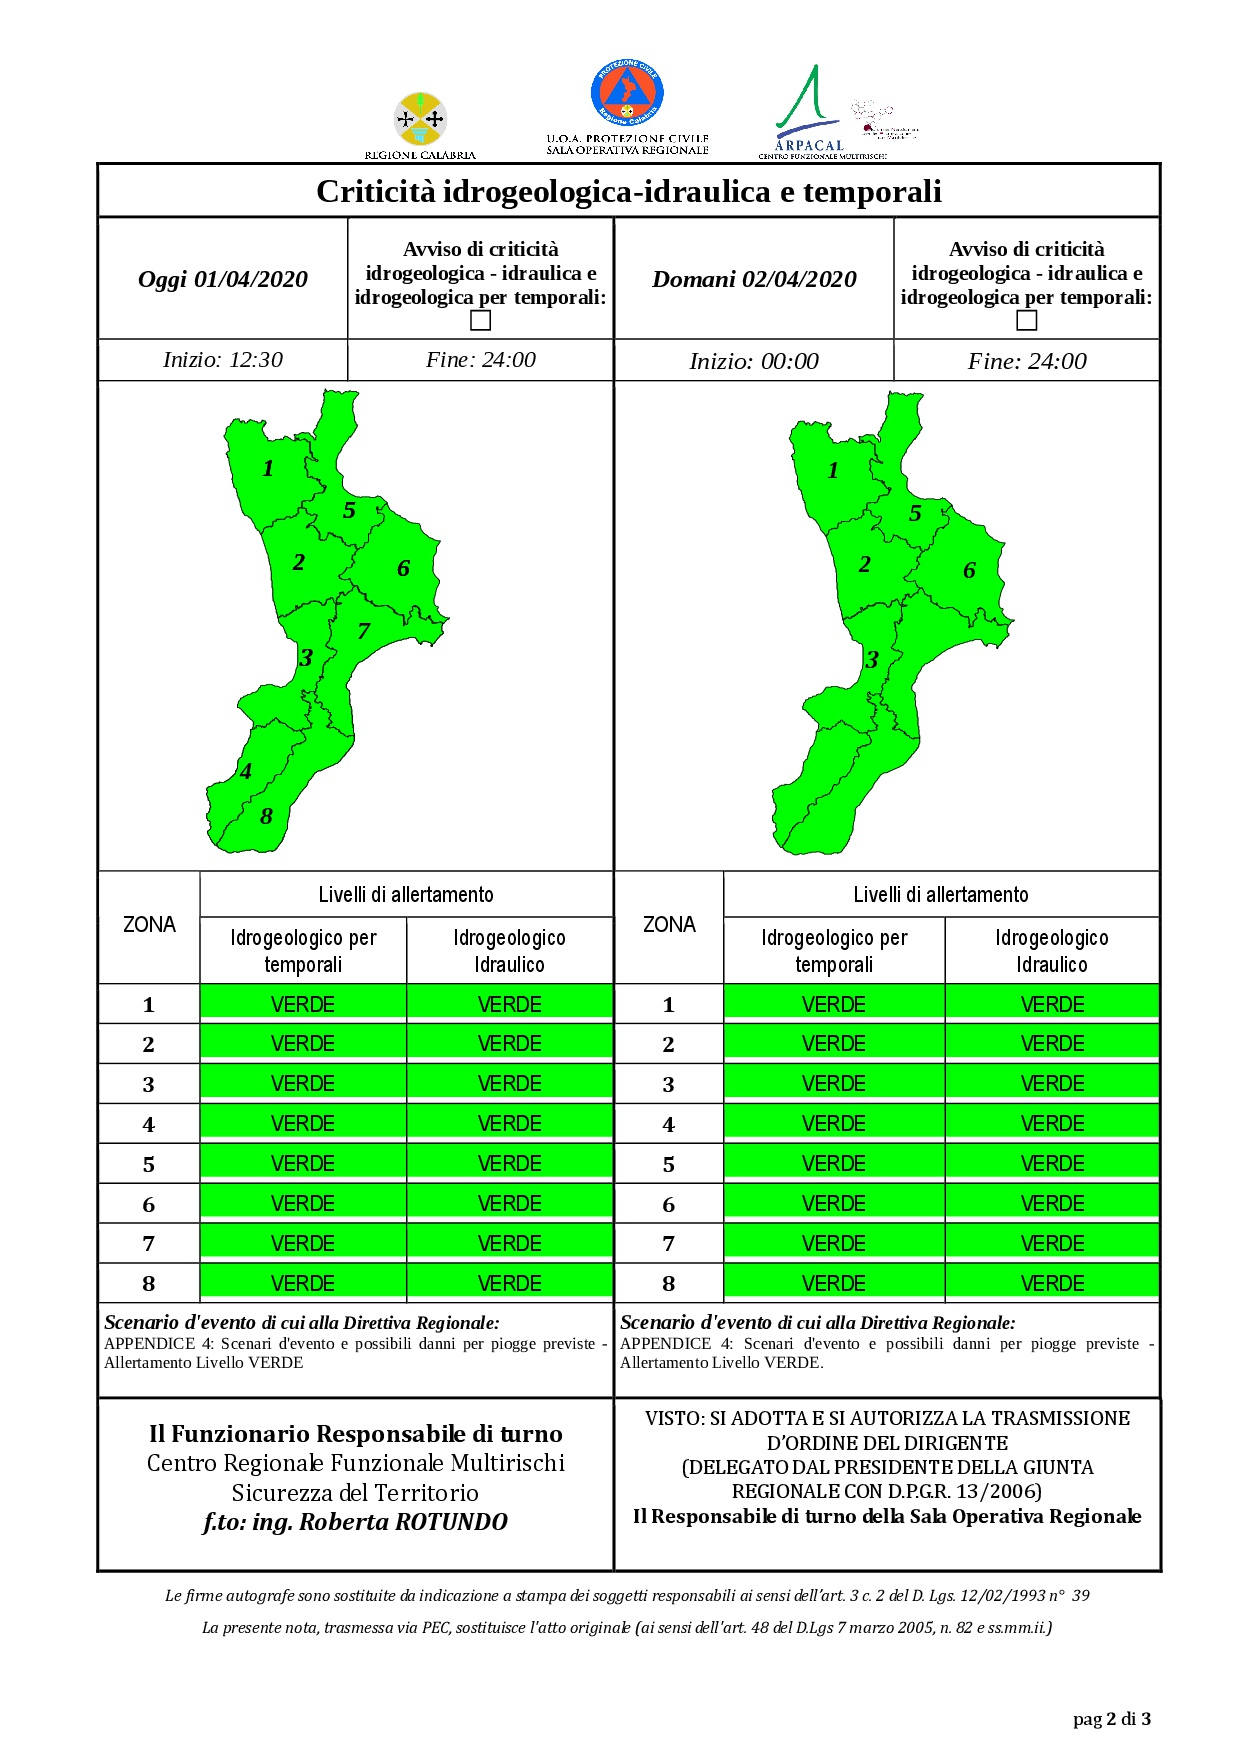 Criticità idrogeologica-idraulica e temporali in Calabria 01-04-2020